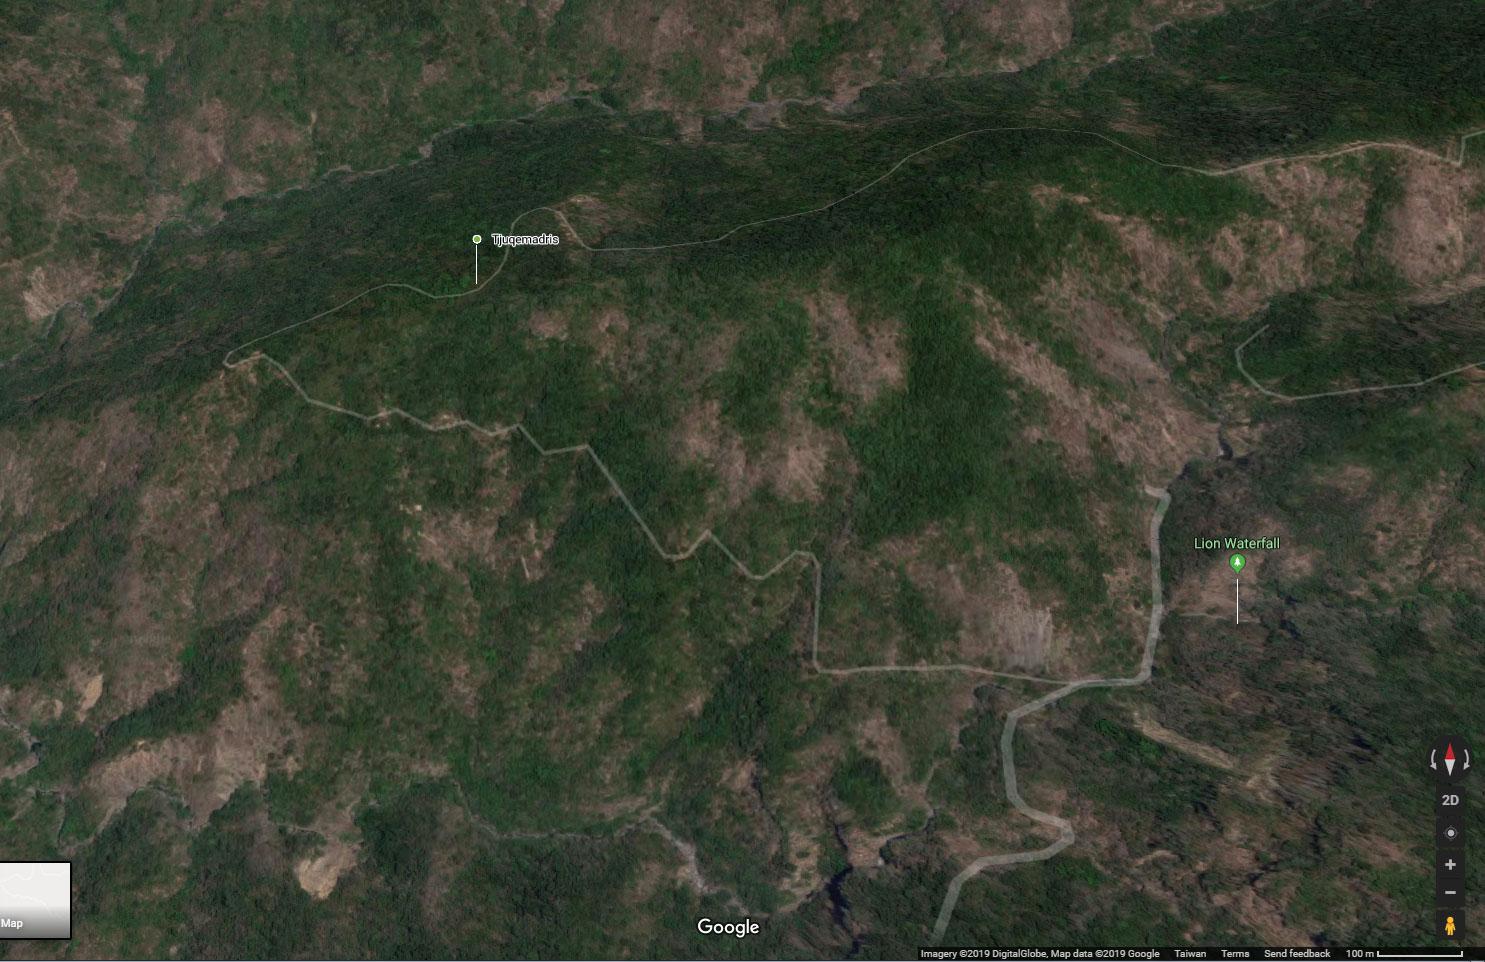 Google map screenshot of Tjuqemadris and road winding around it